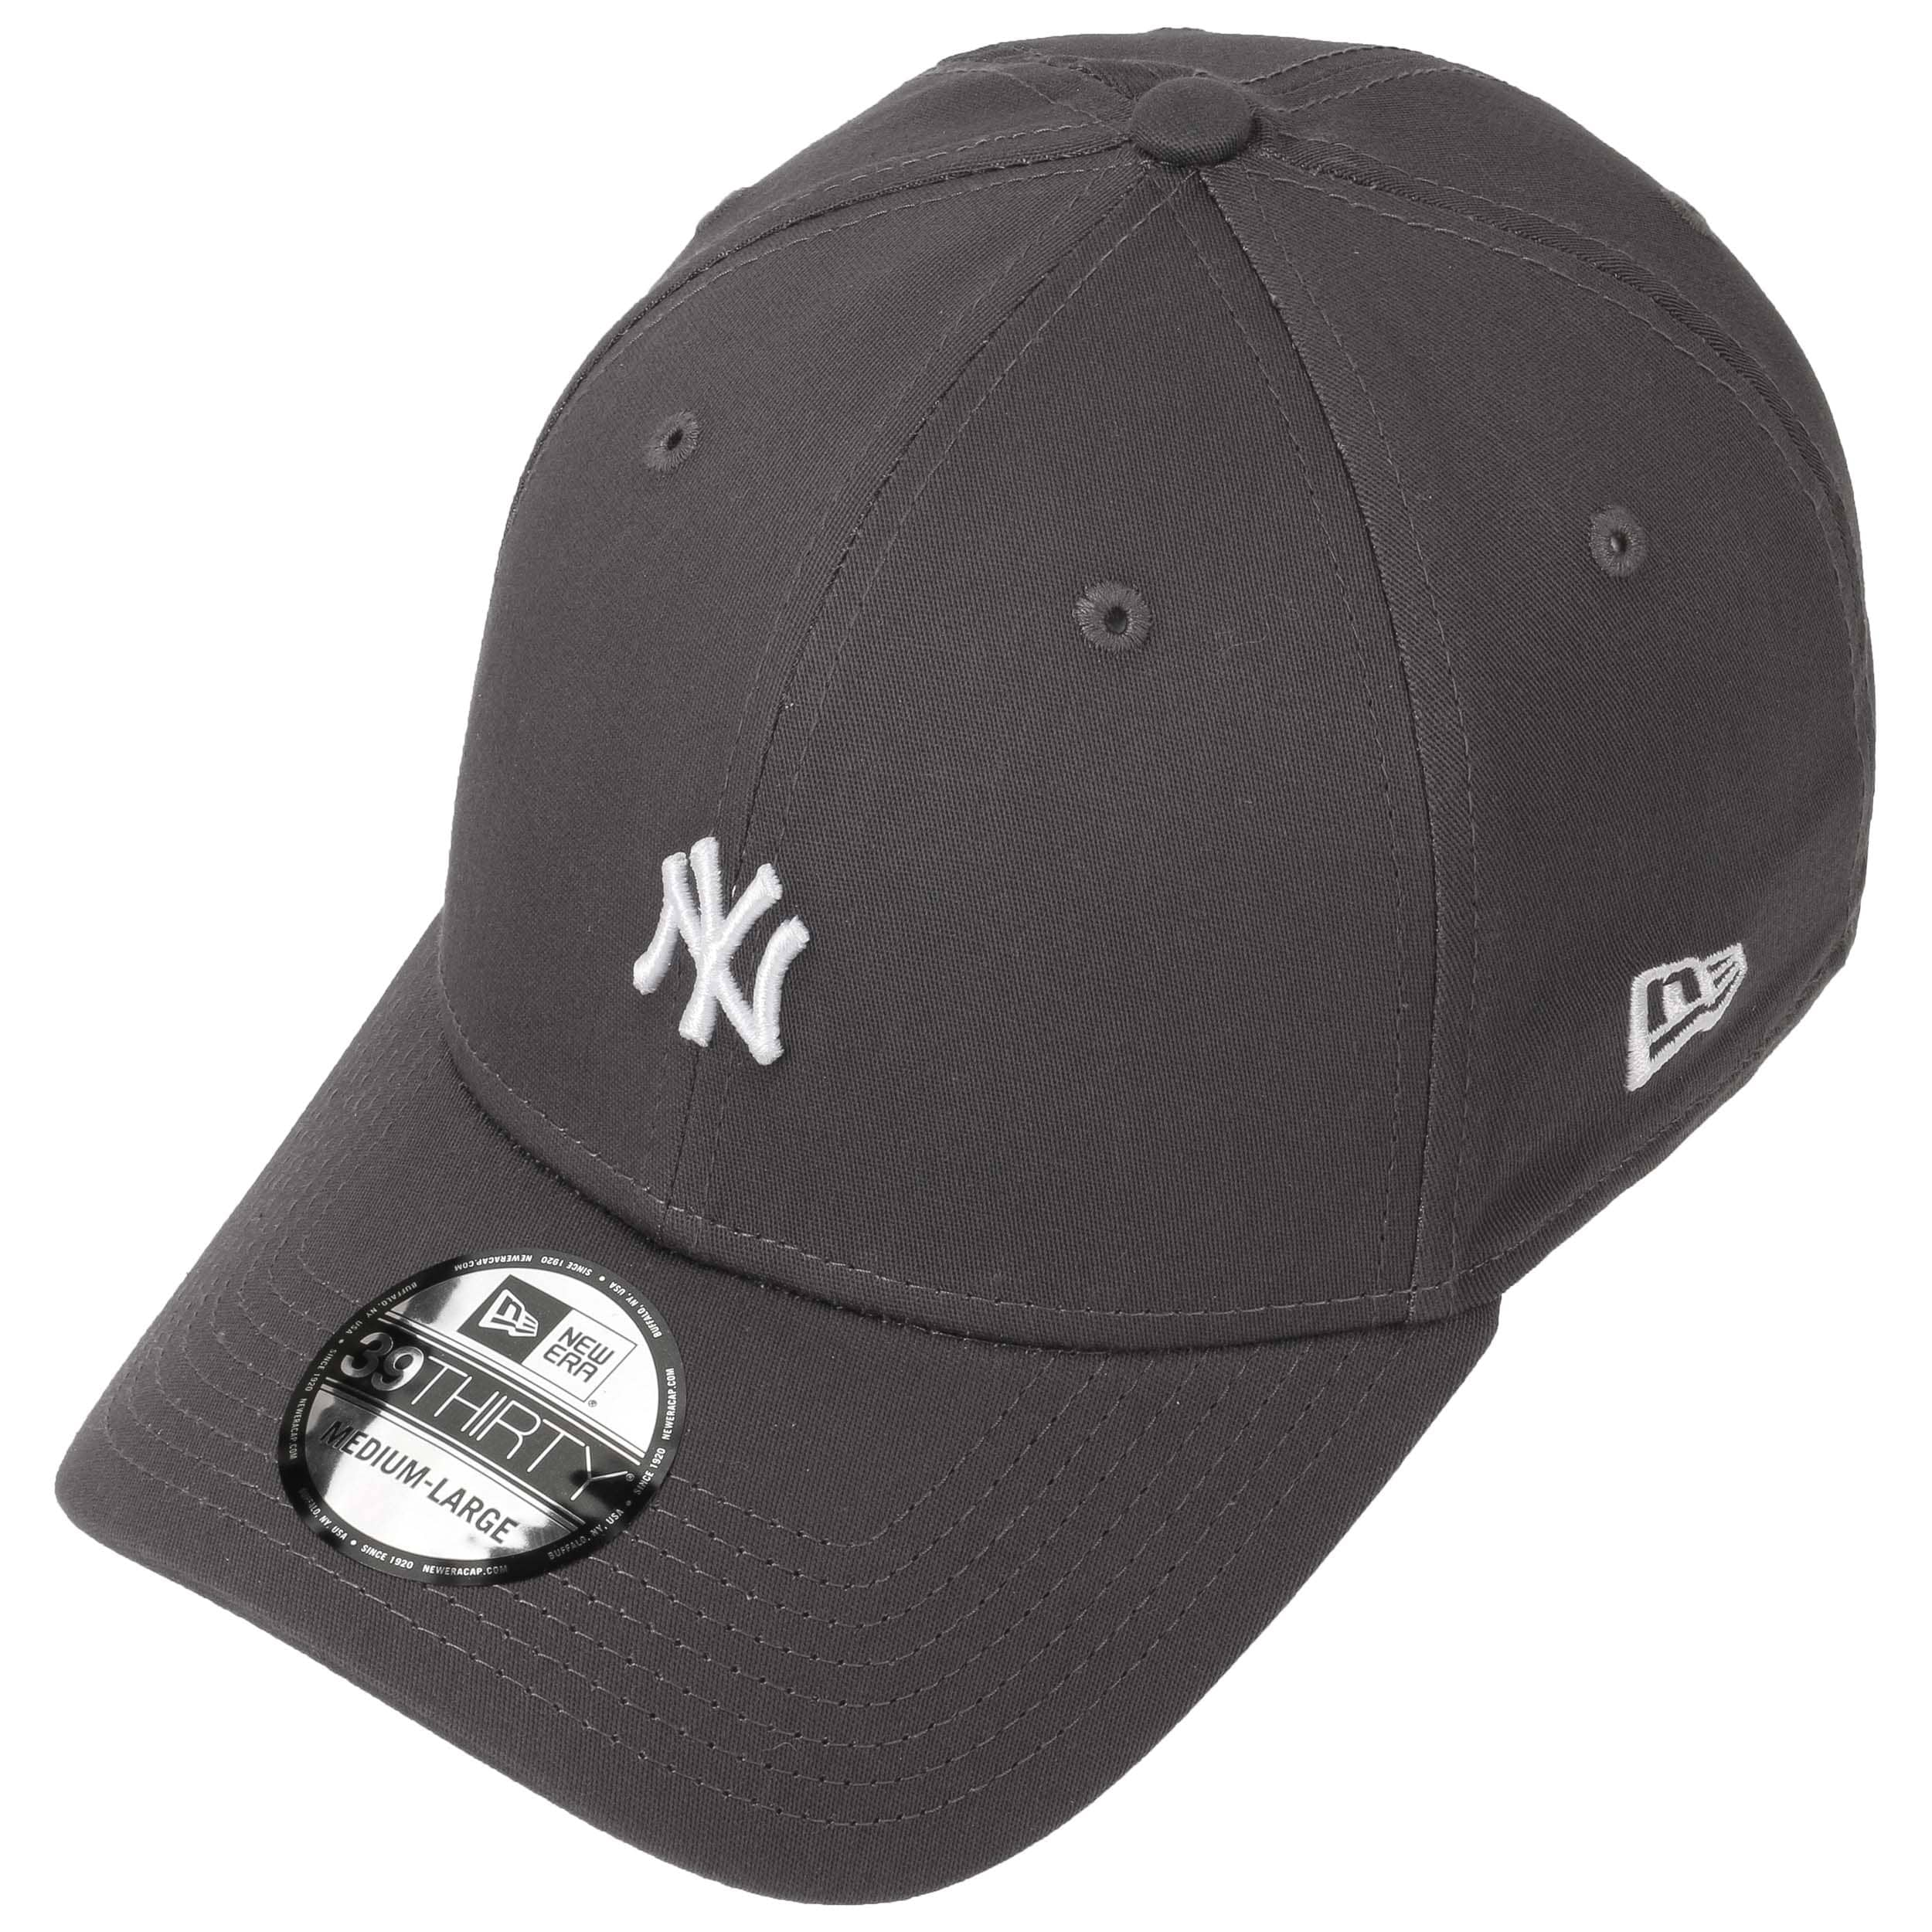 a357774693f3b Gorra 39Thirty Mini Logo Yankees by New Era - Gorras - sombreroshop.es